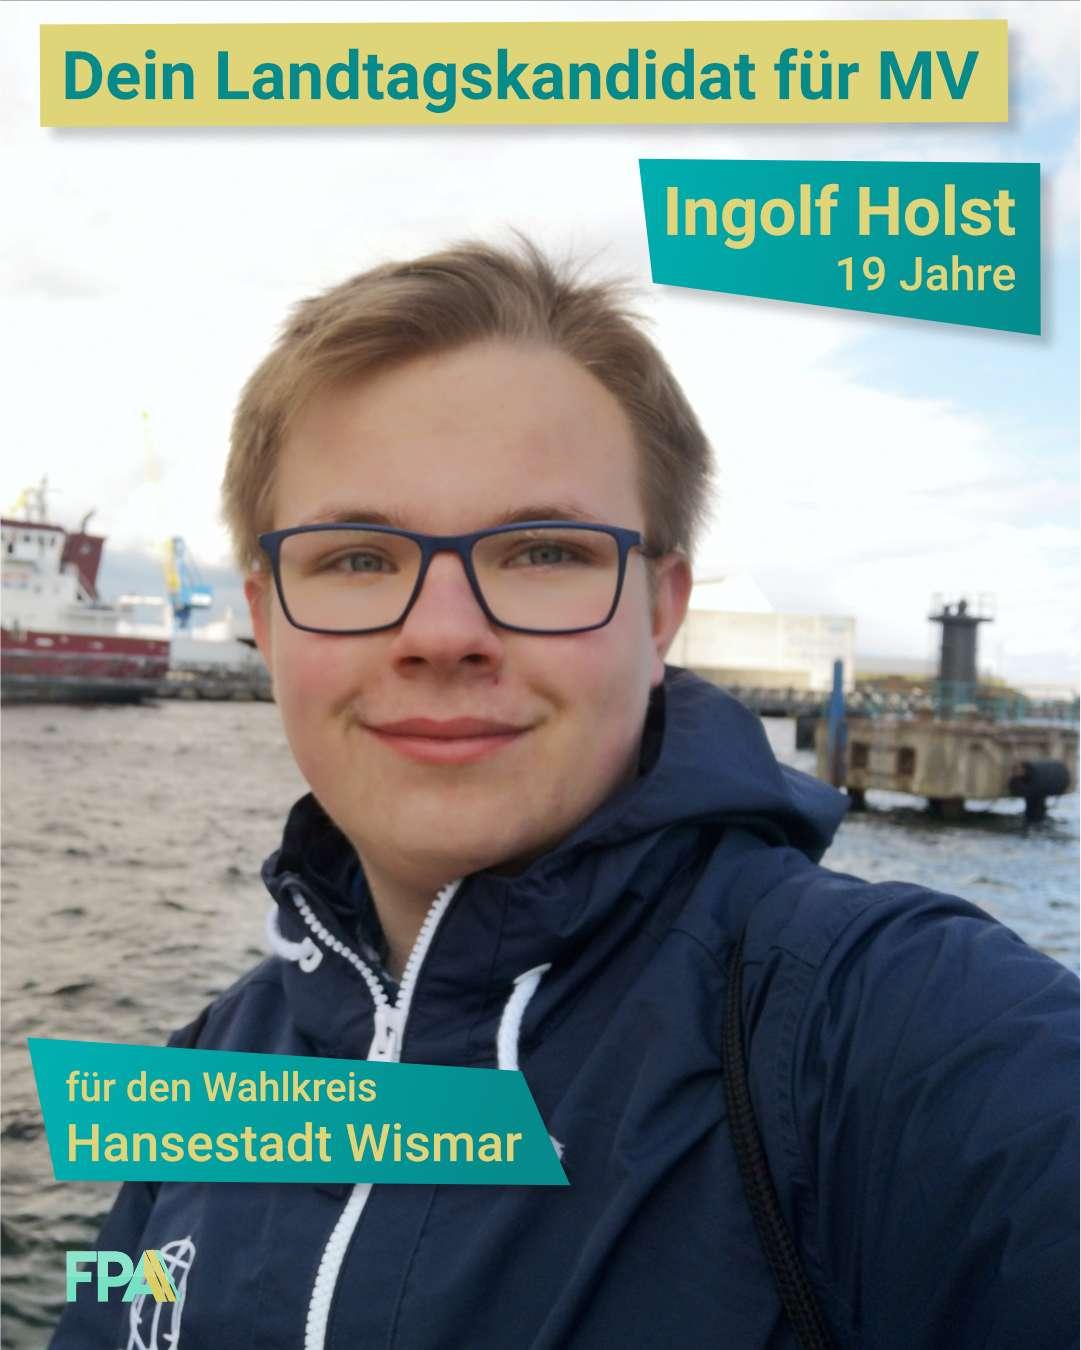 Ingolf Holst